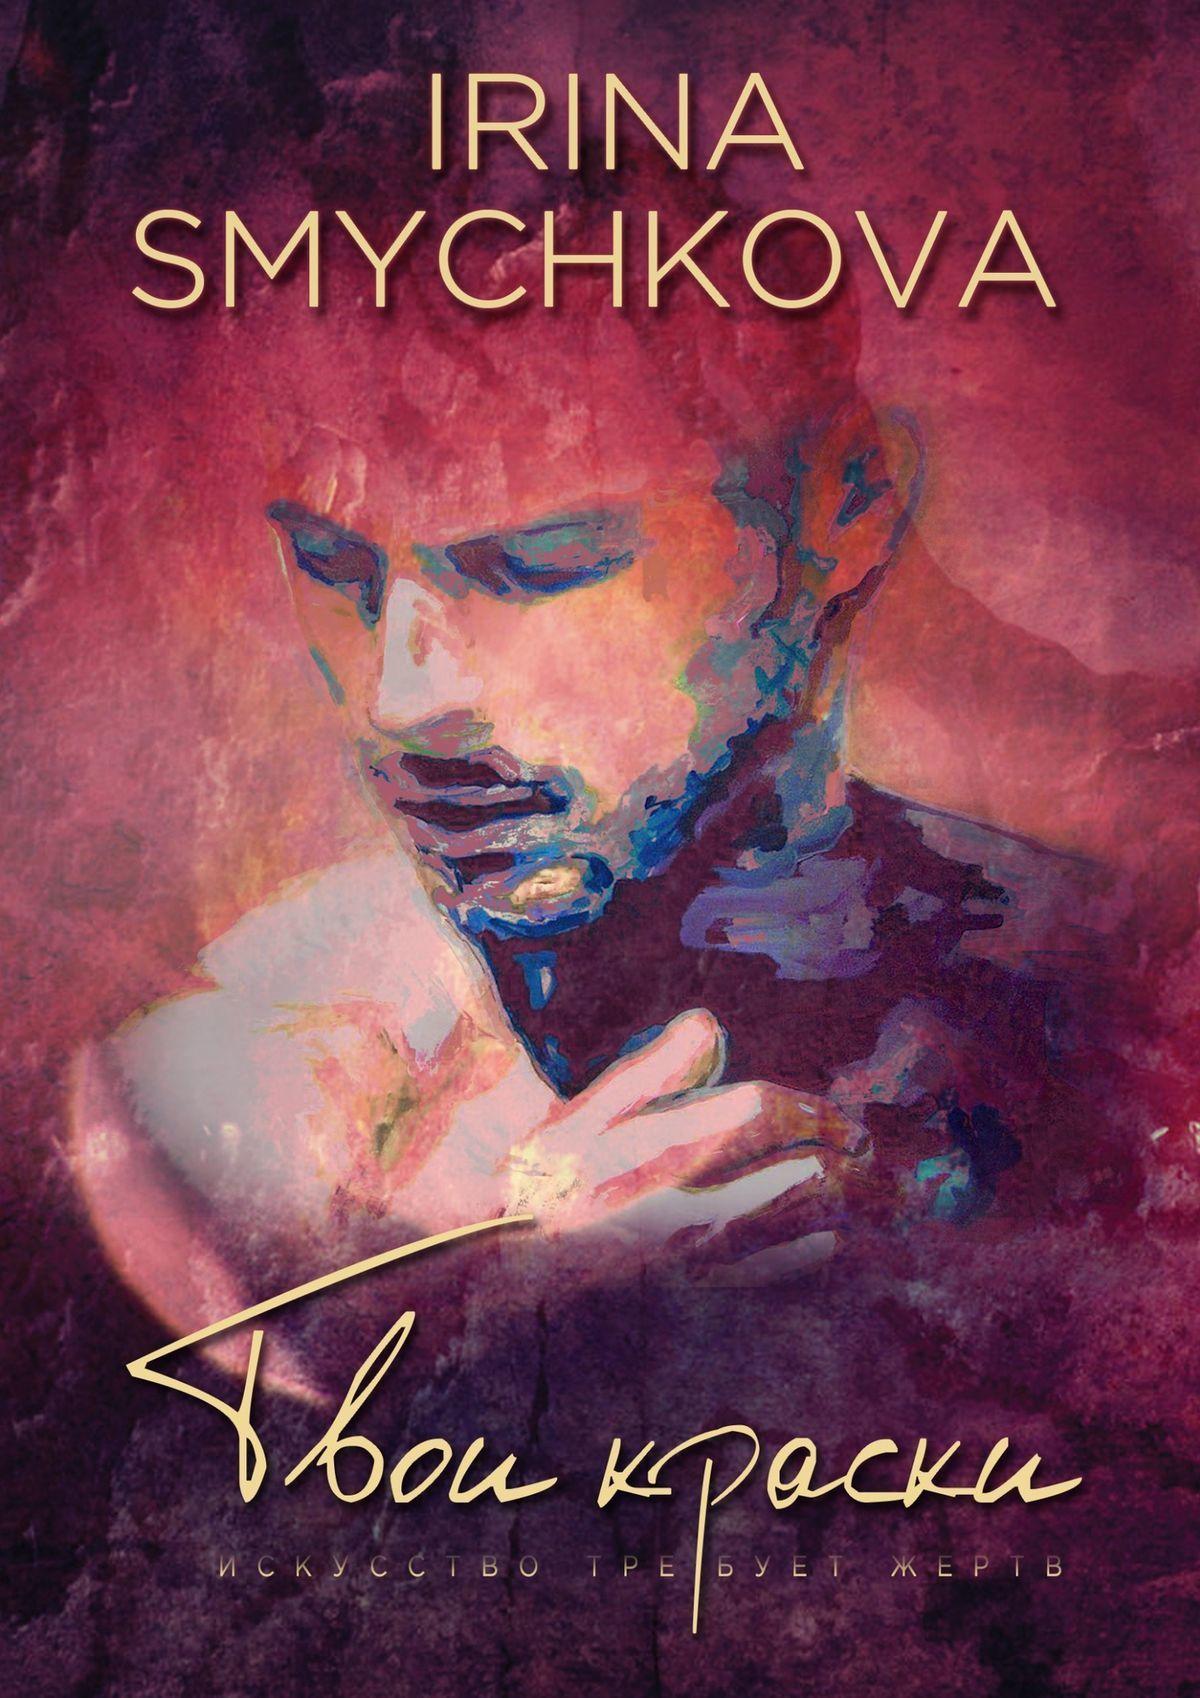 Irina Smychkova - Твои краски. Искусство требует жертв